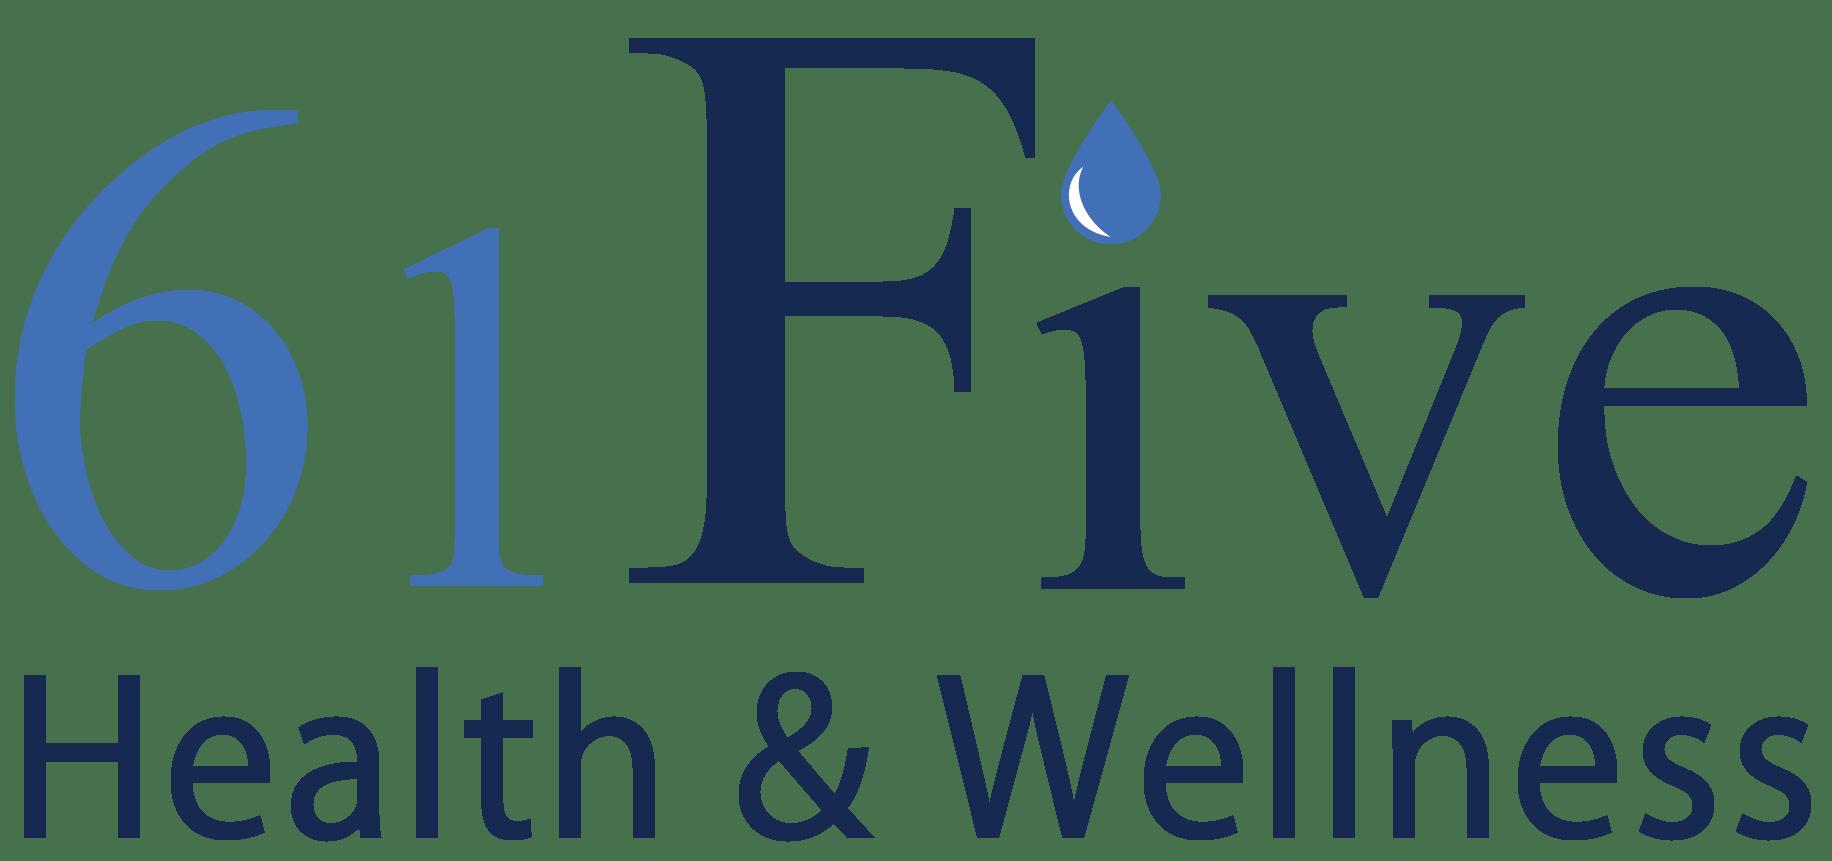 61Five Health & Wellness